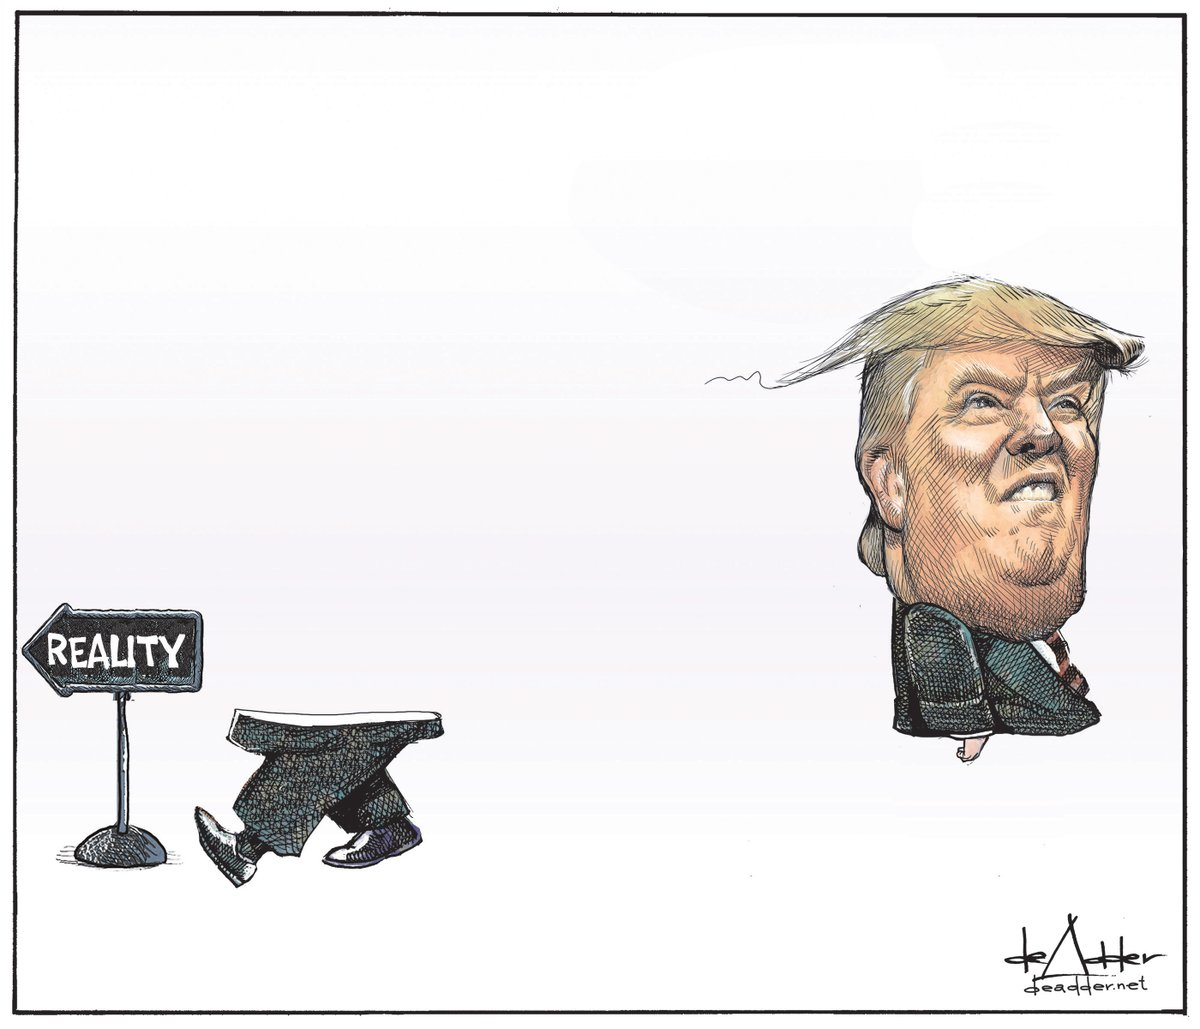 Cartoon repost. #cartoonrepost for #ThrowbackThursday #TrumpImpeachment #TrumpBribery